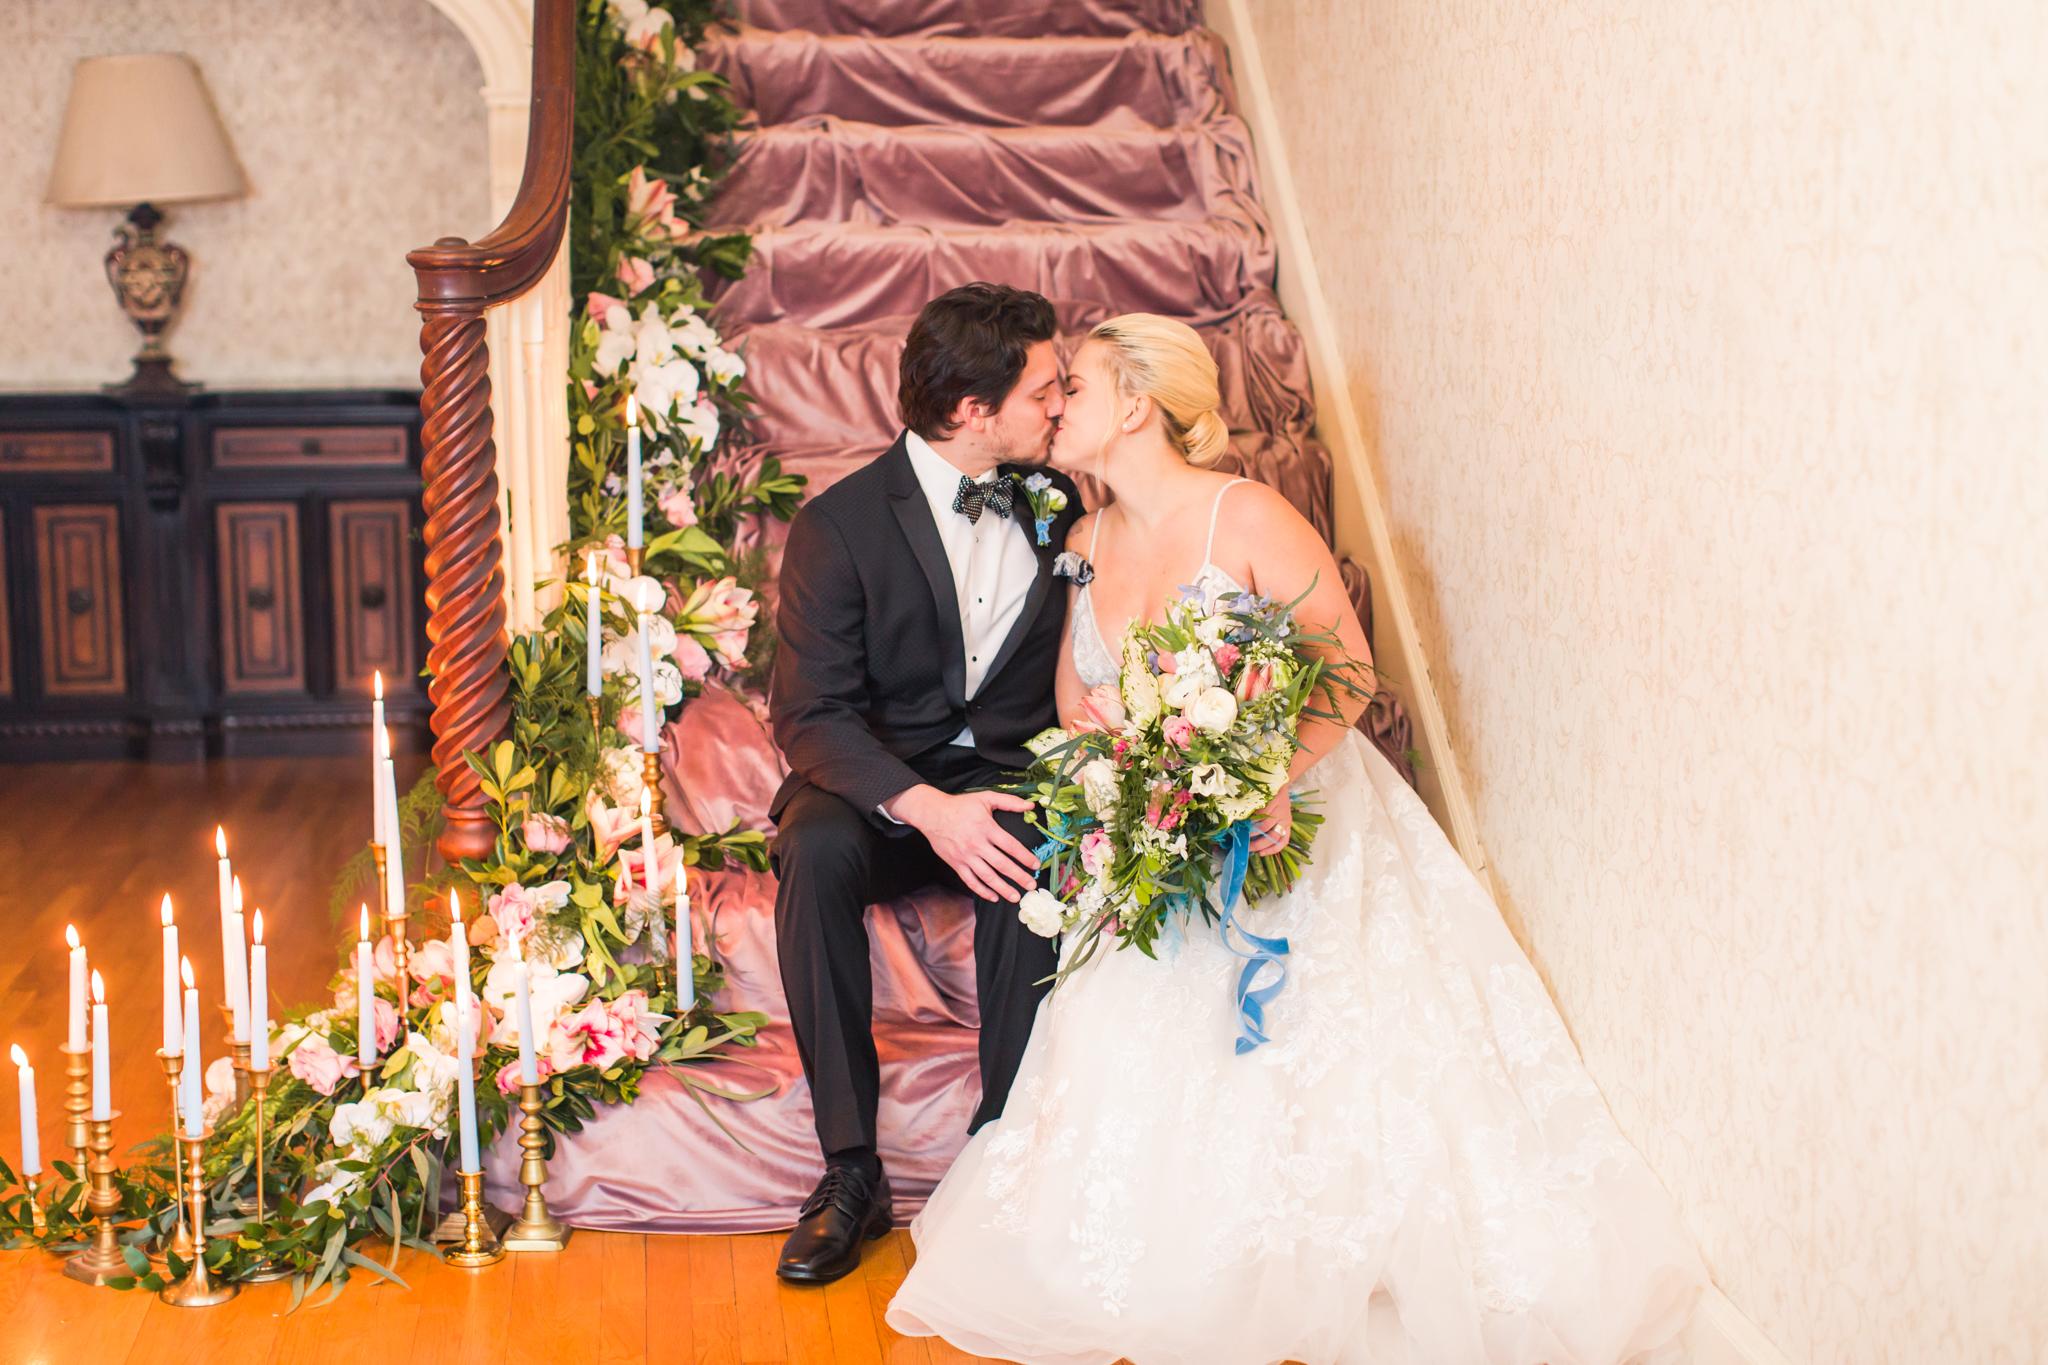 Haley Mansion Winter Wedding - Shaina Lee Photography-127.jpg